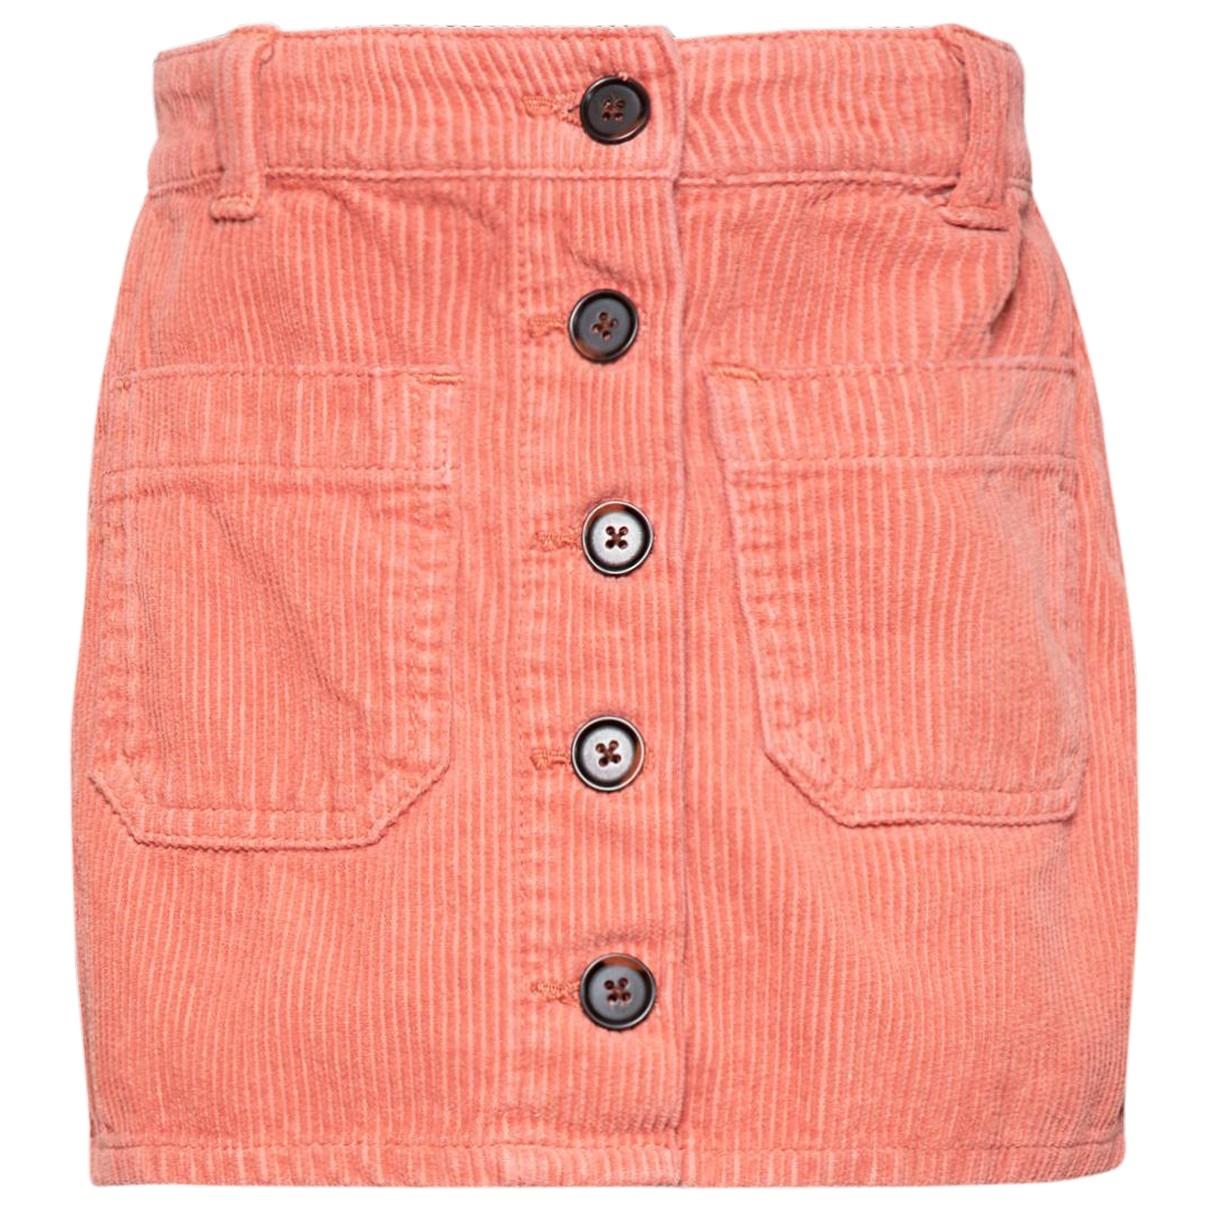 American Outfitters - Jupe   pour enfant en velours - rose